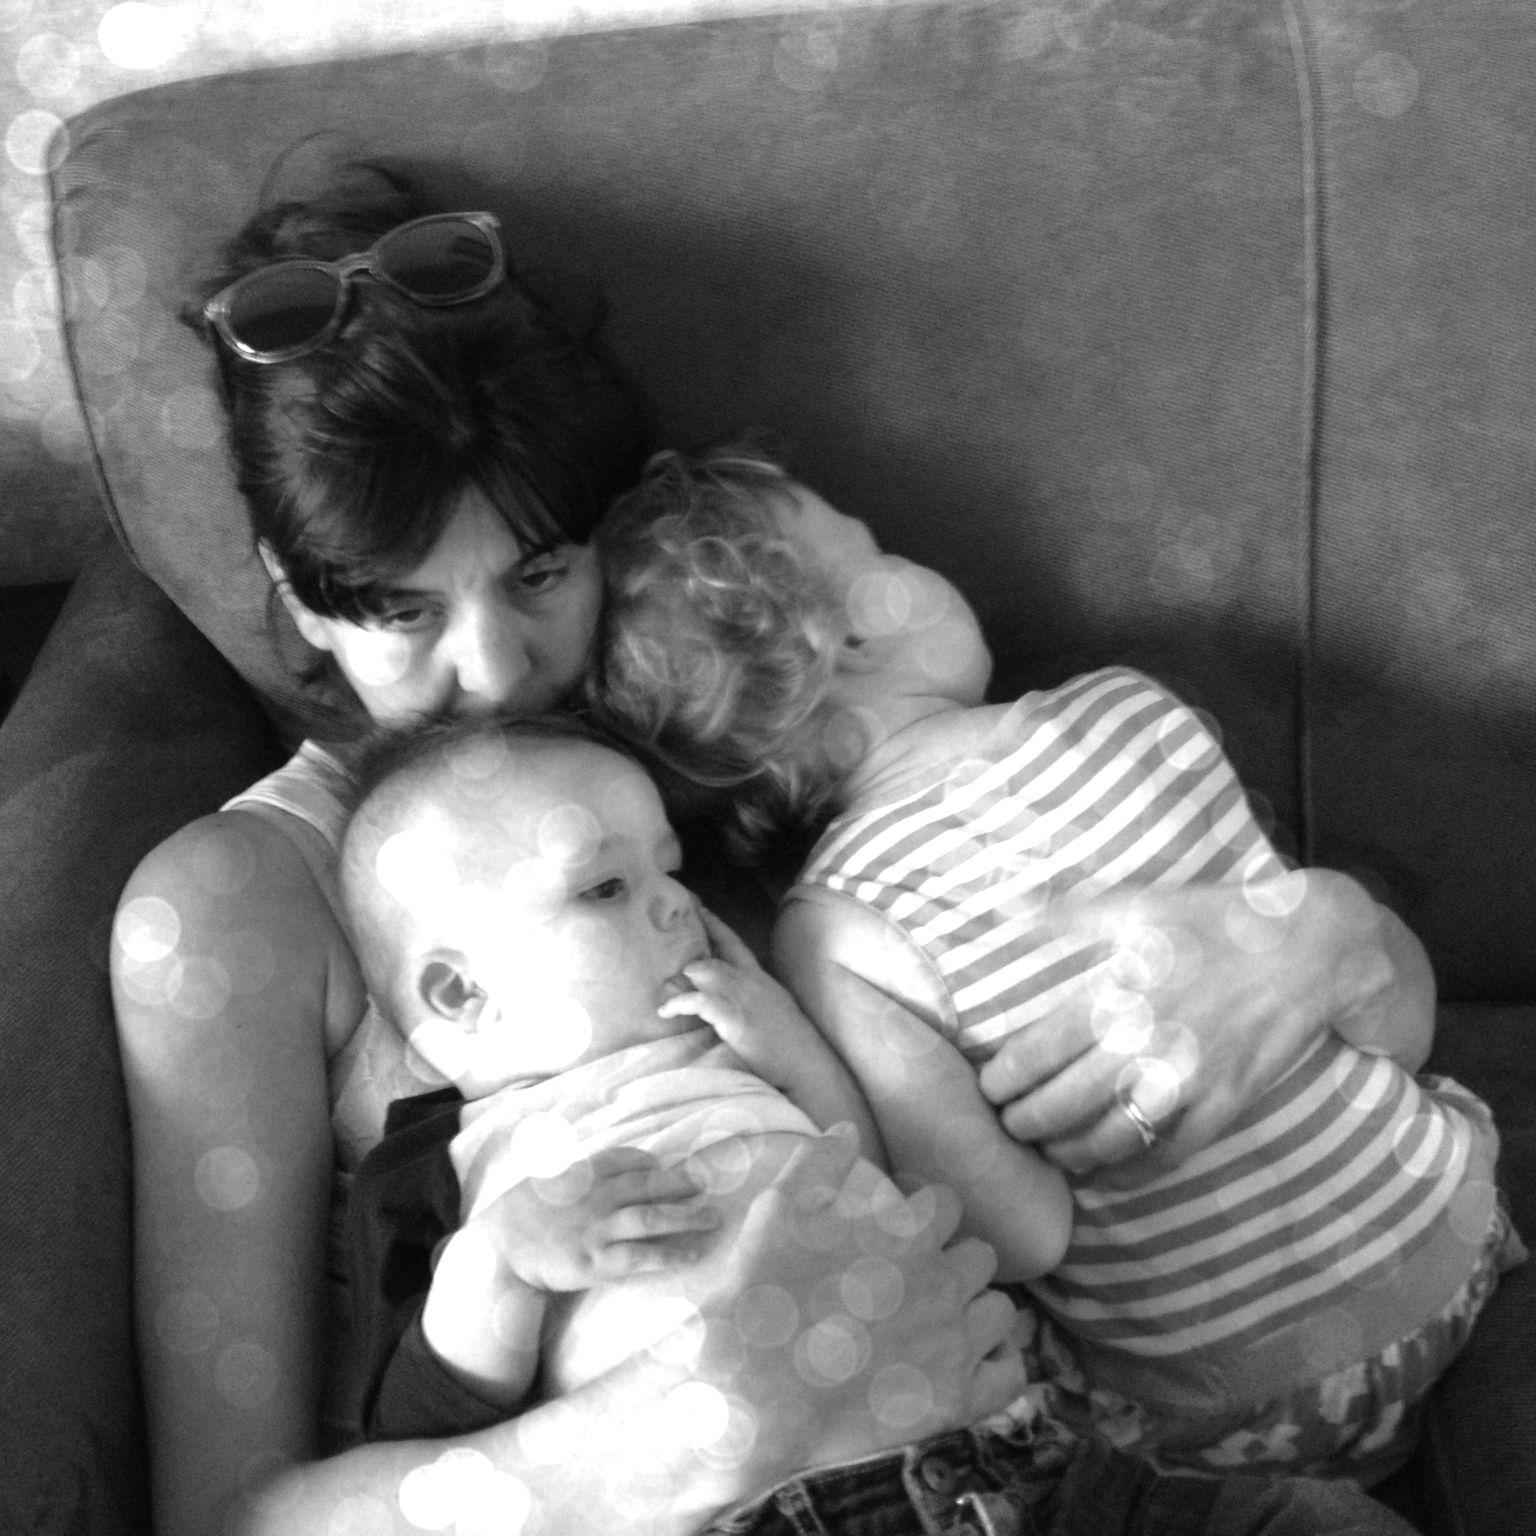 sewing and motherhood